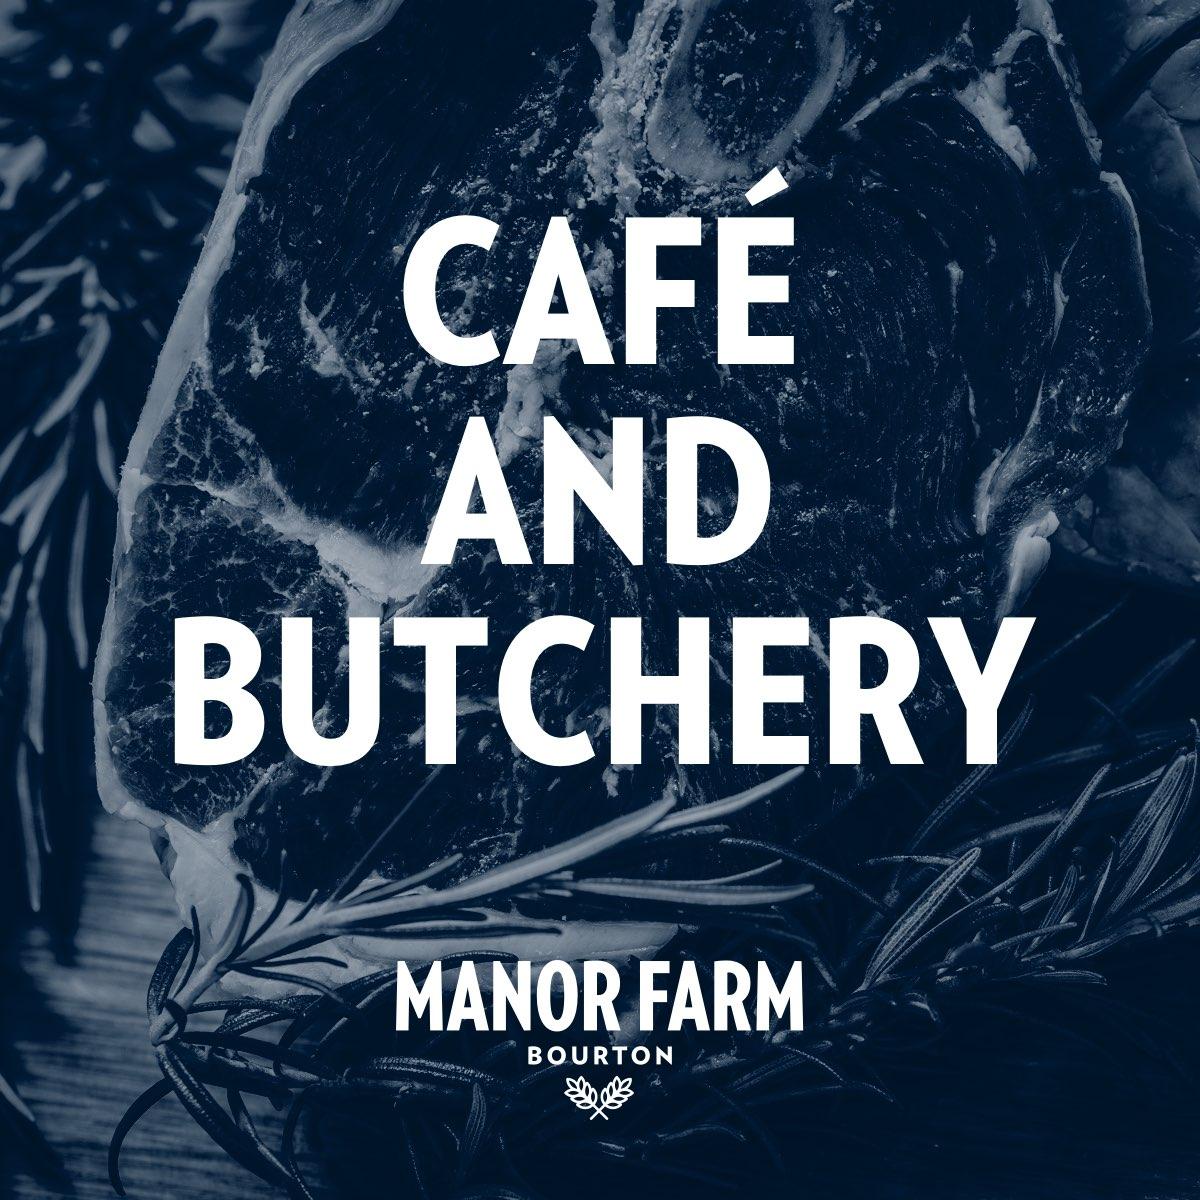 Café and Butchery